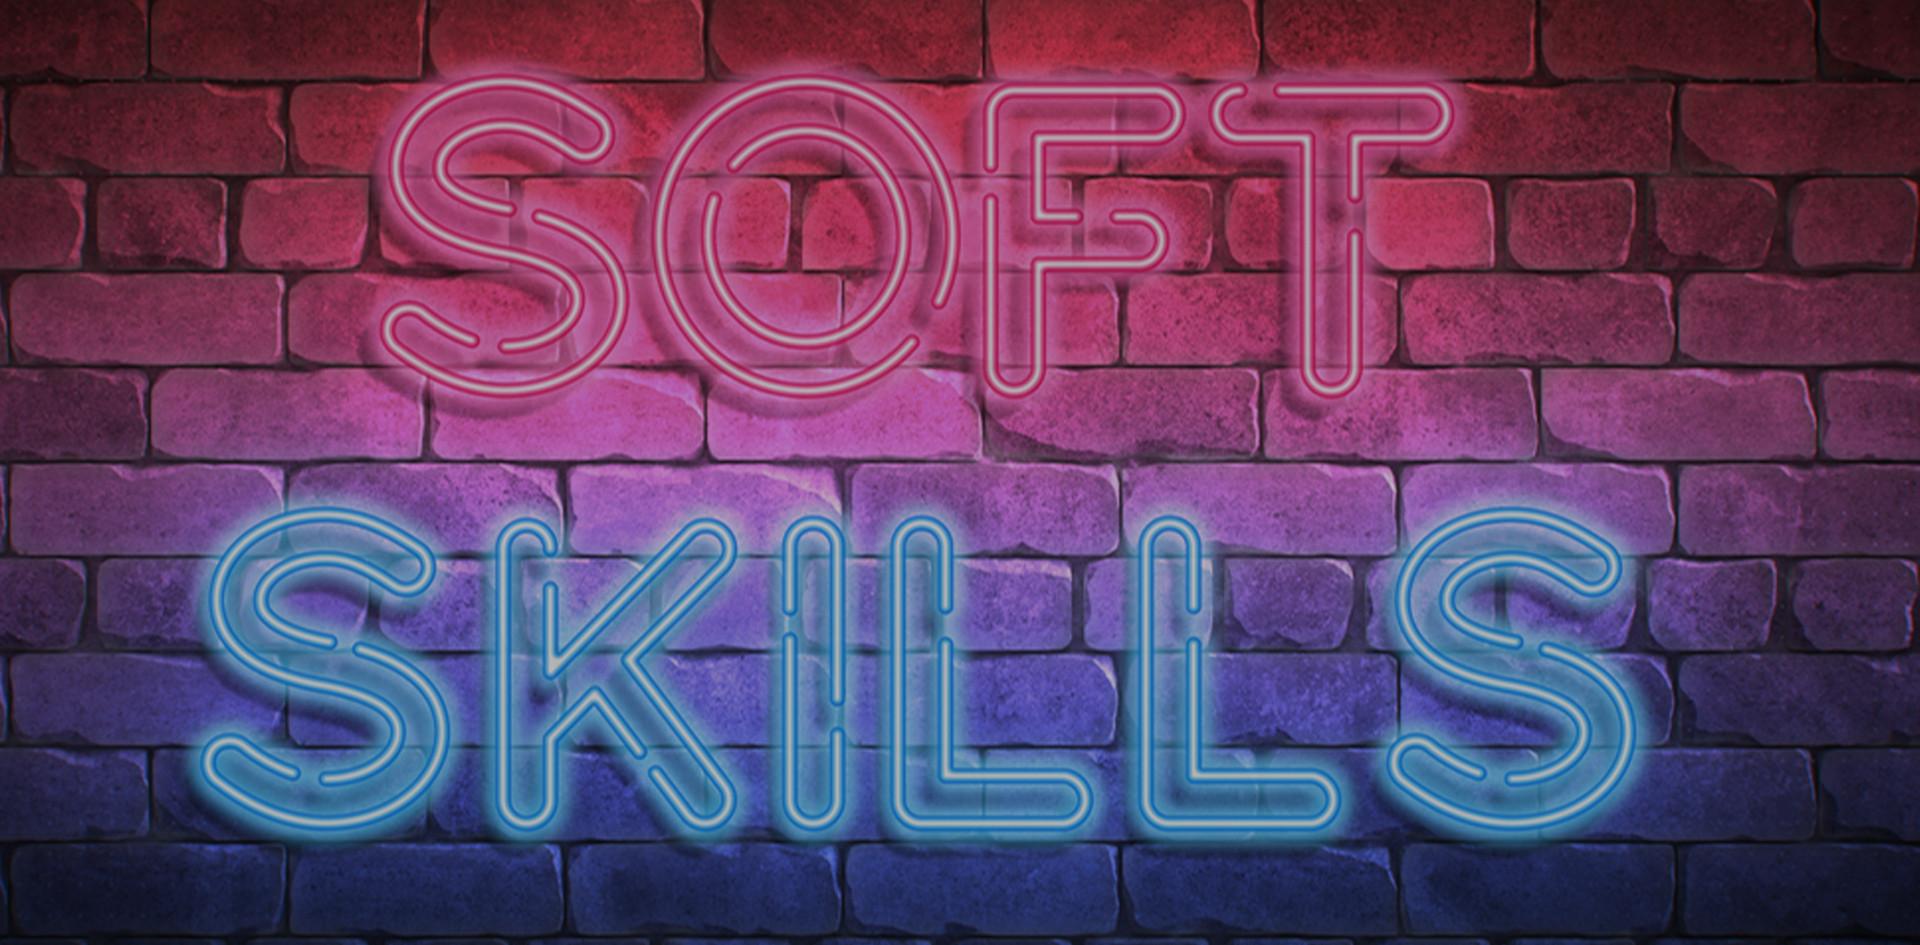 soft-skills-neon-sign-on-a-wall.jpg